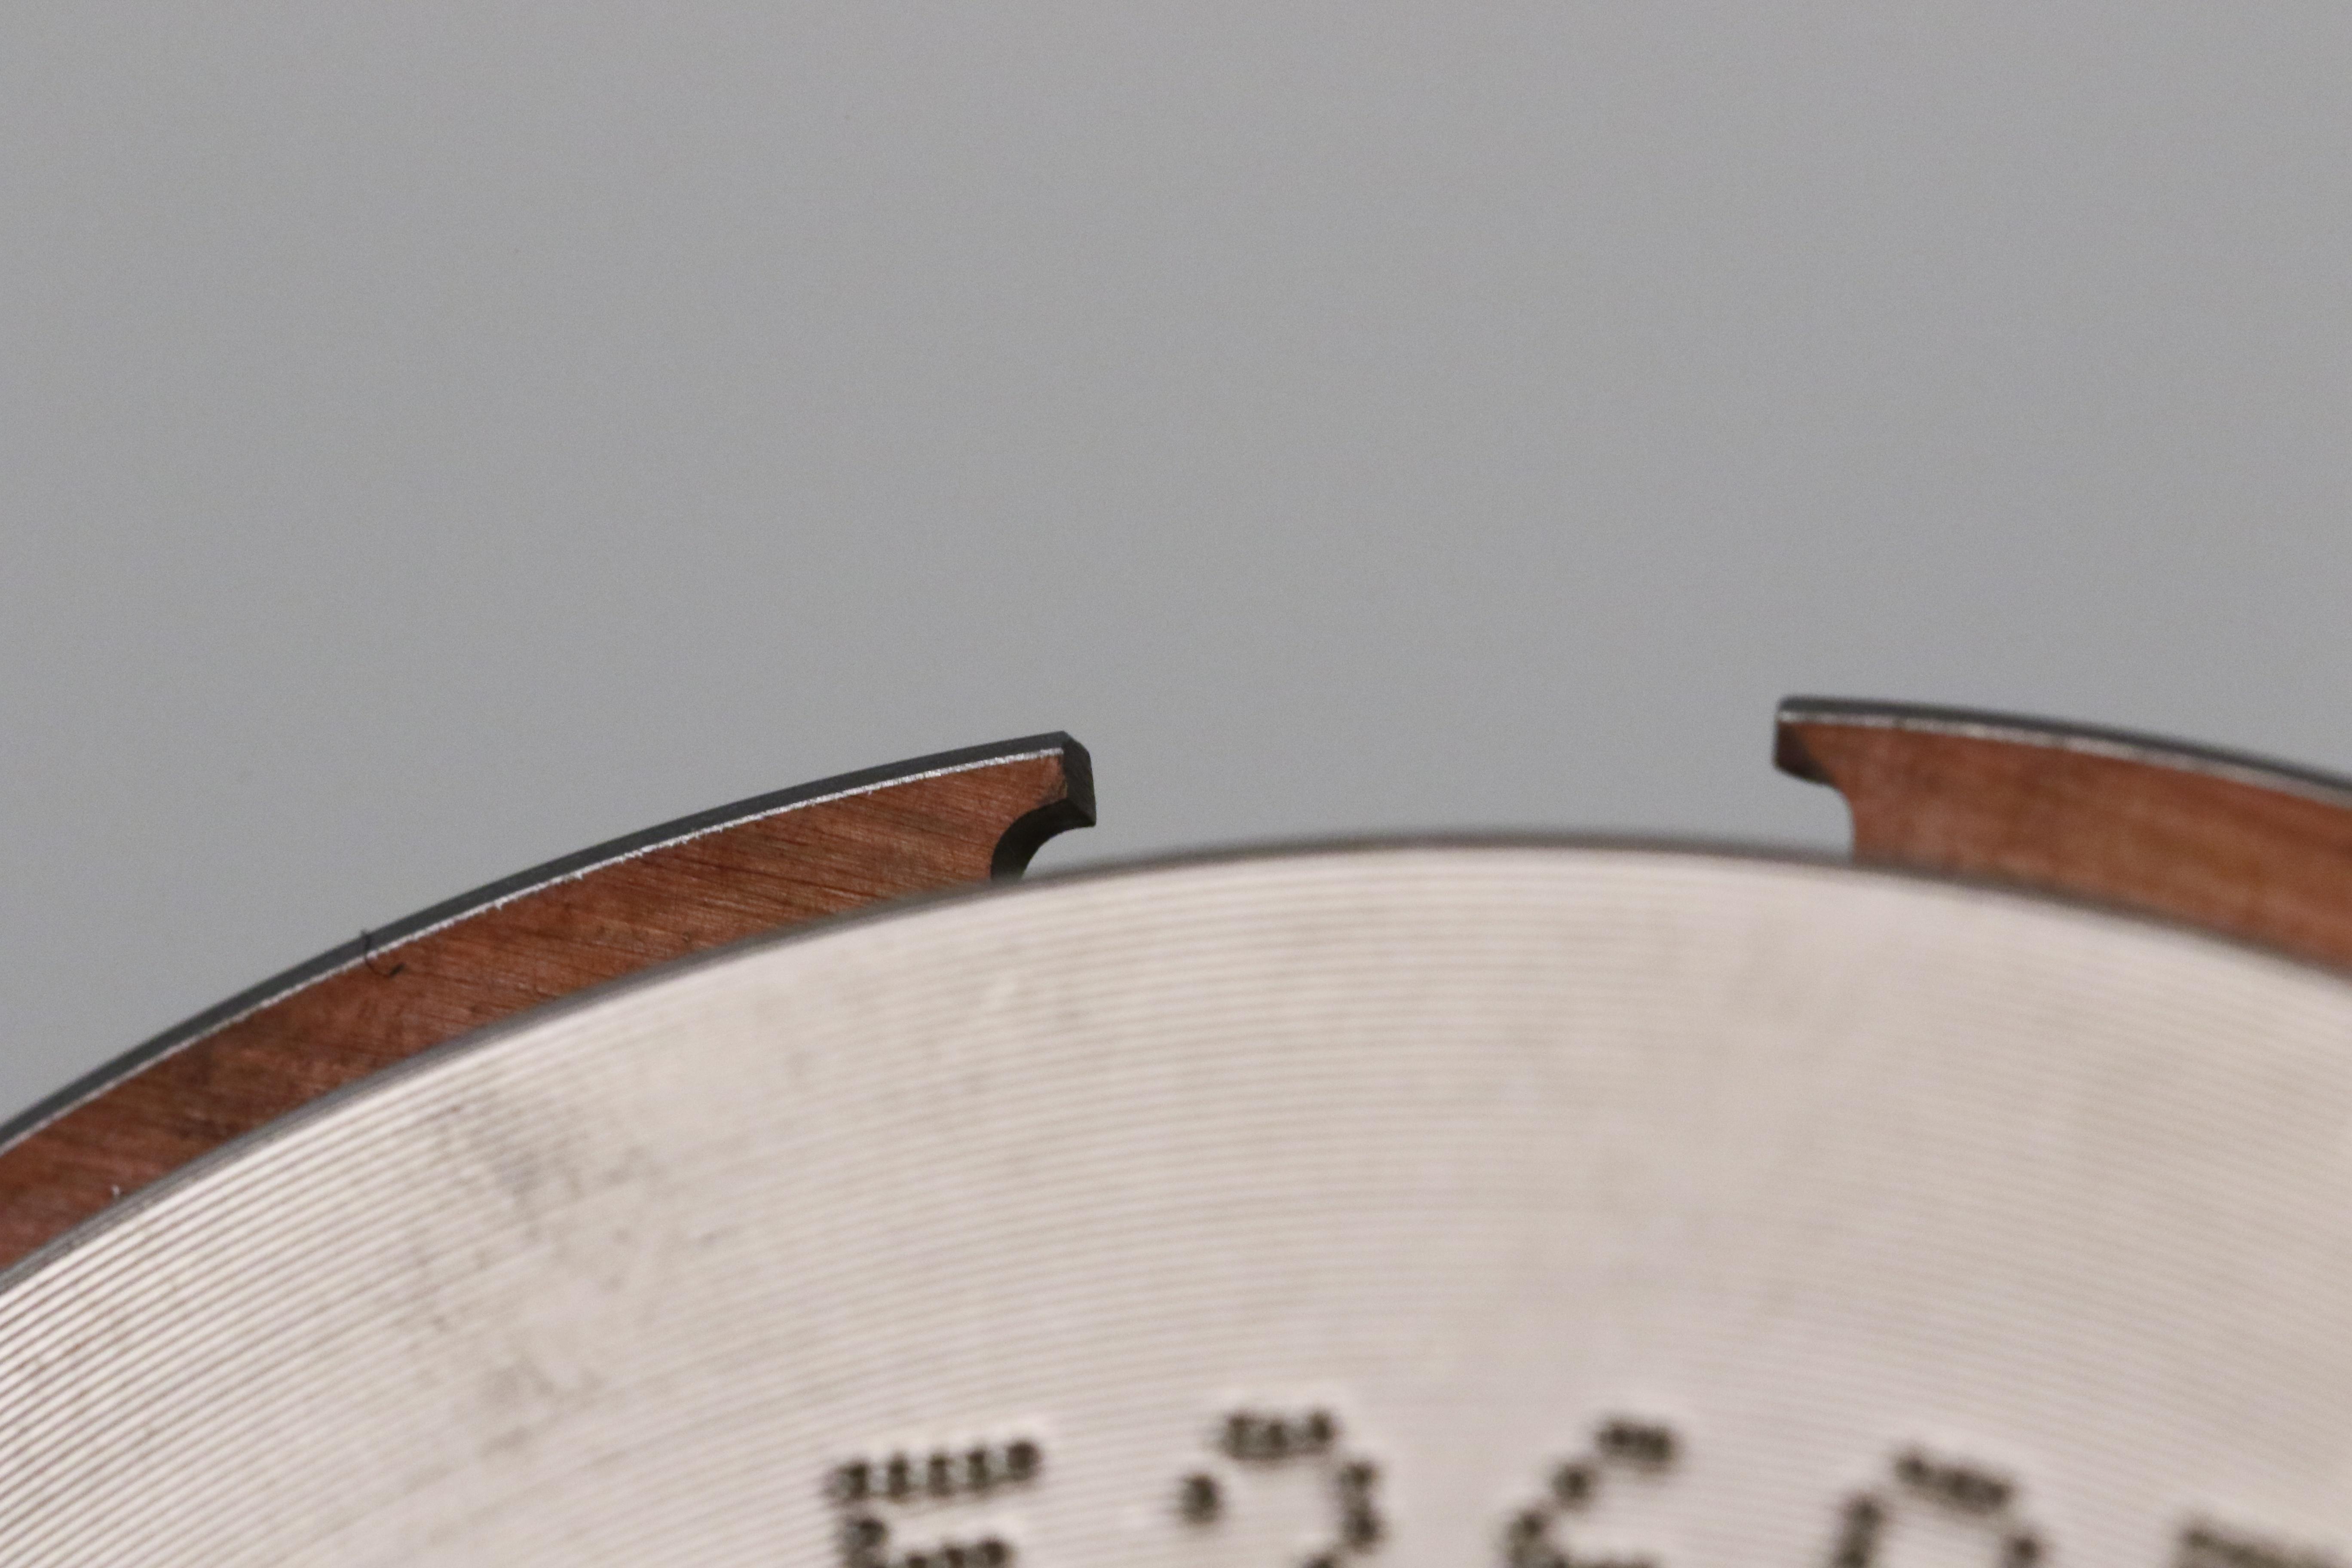 Locating Pin: Defense Against Two-Stroke Piston Ring Destruction